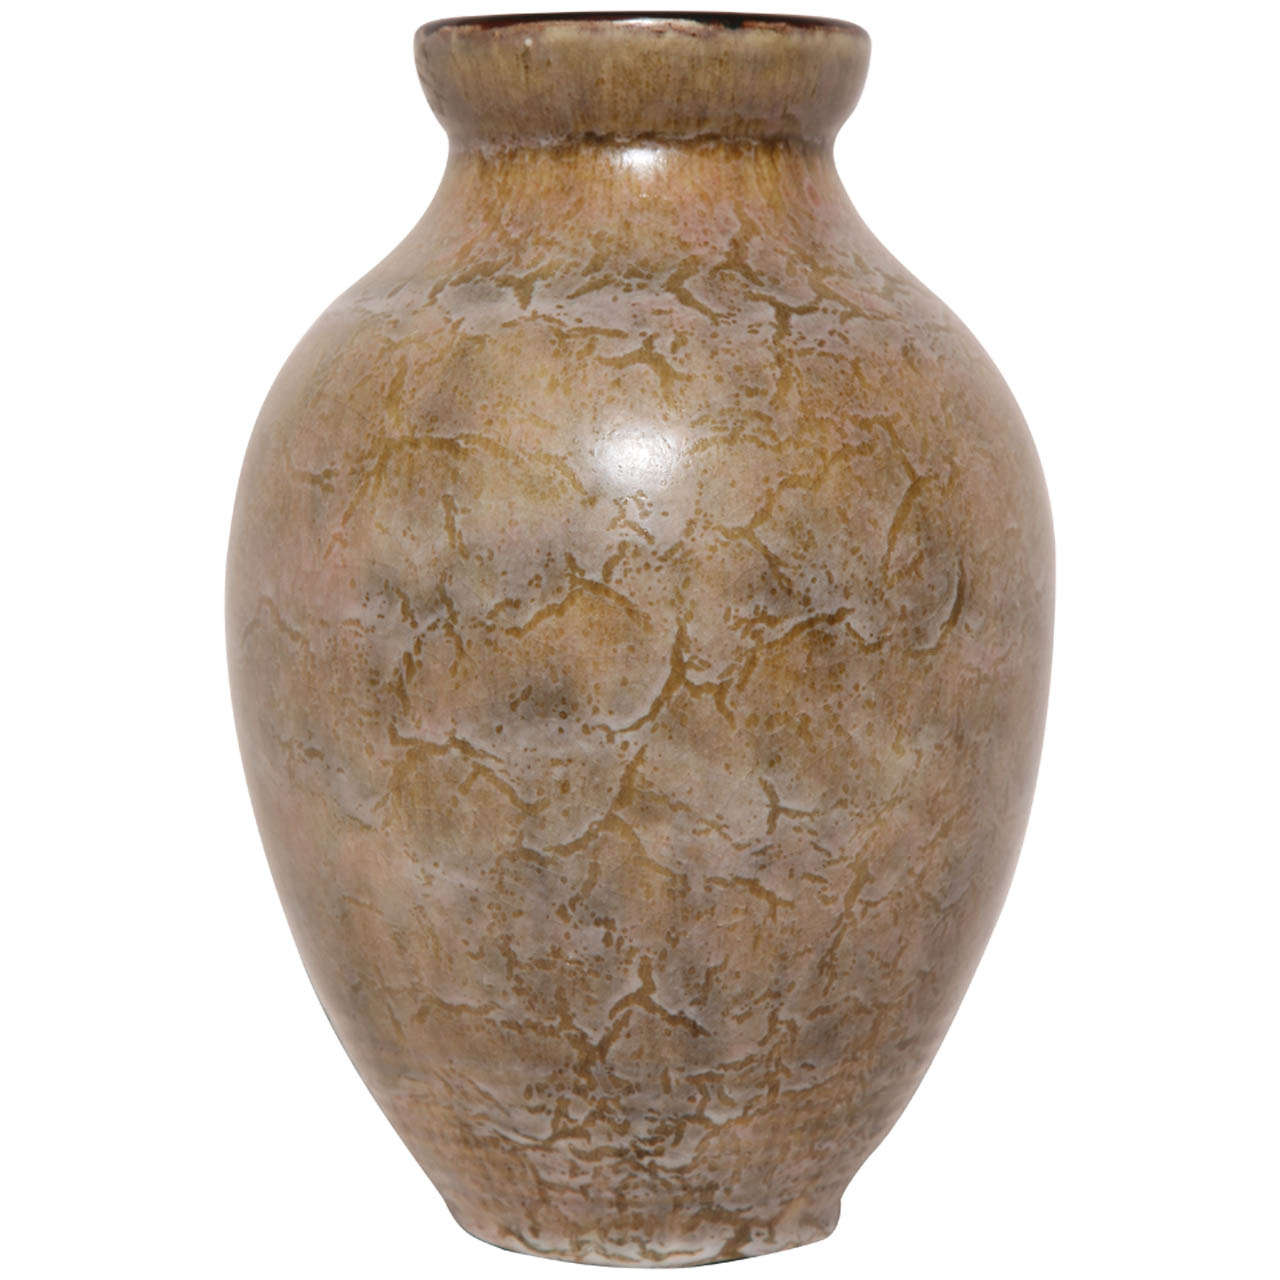 Emile Decoeur French Art Deco Stoneware Vase For Sale